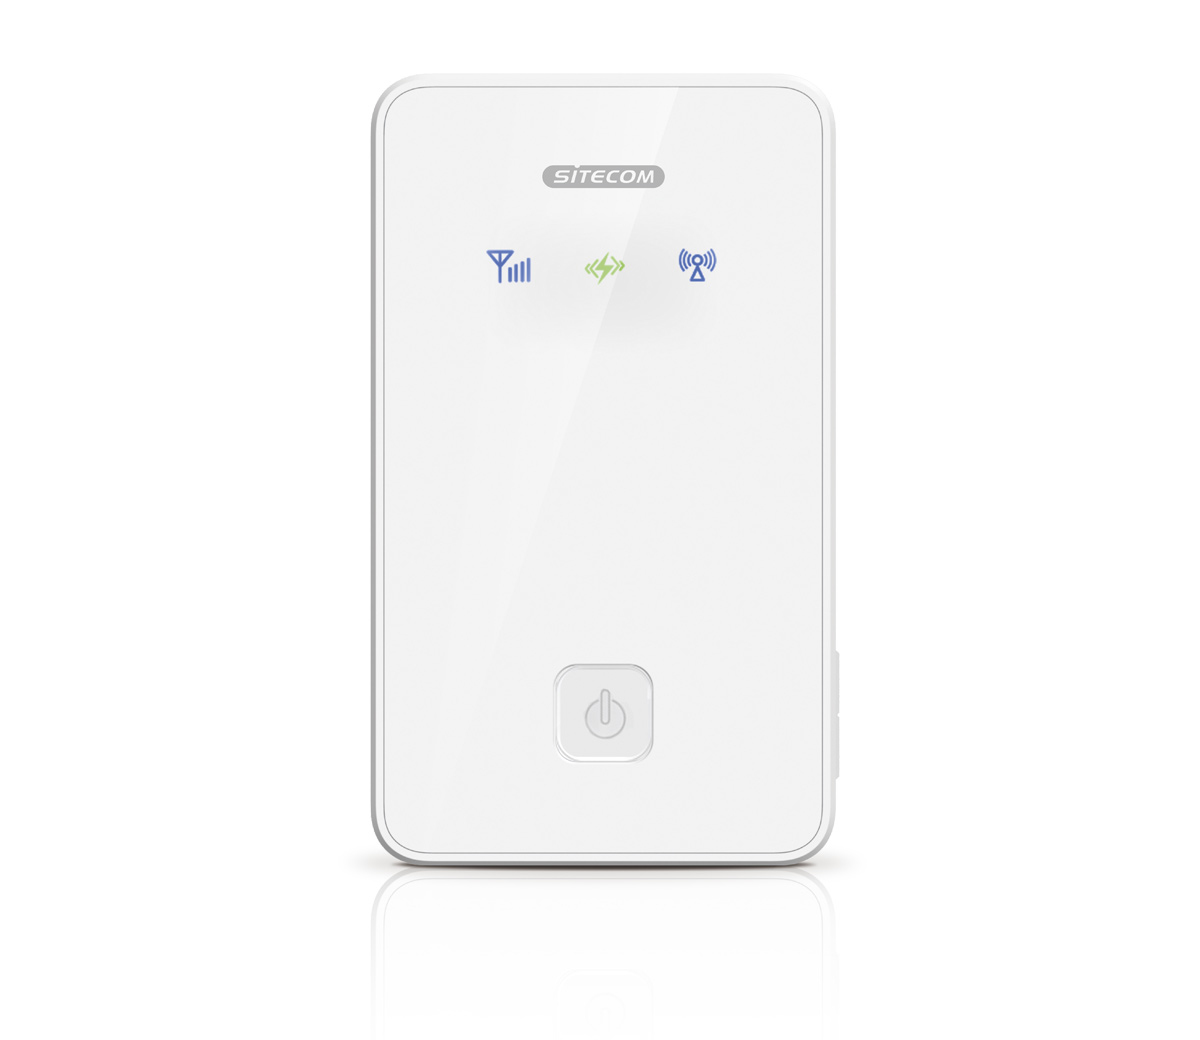 wlm pour mobile